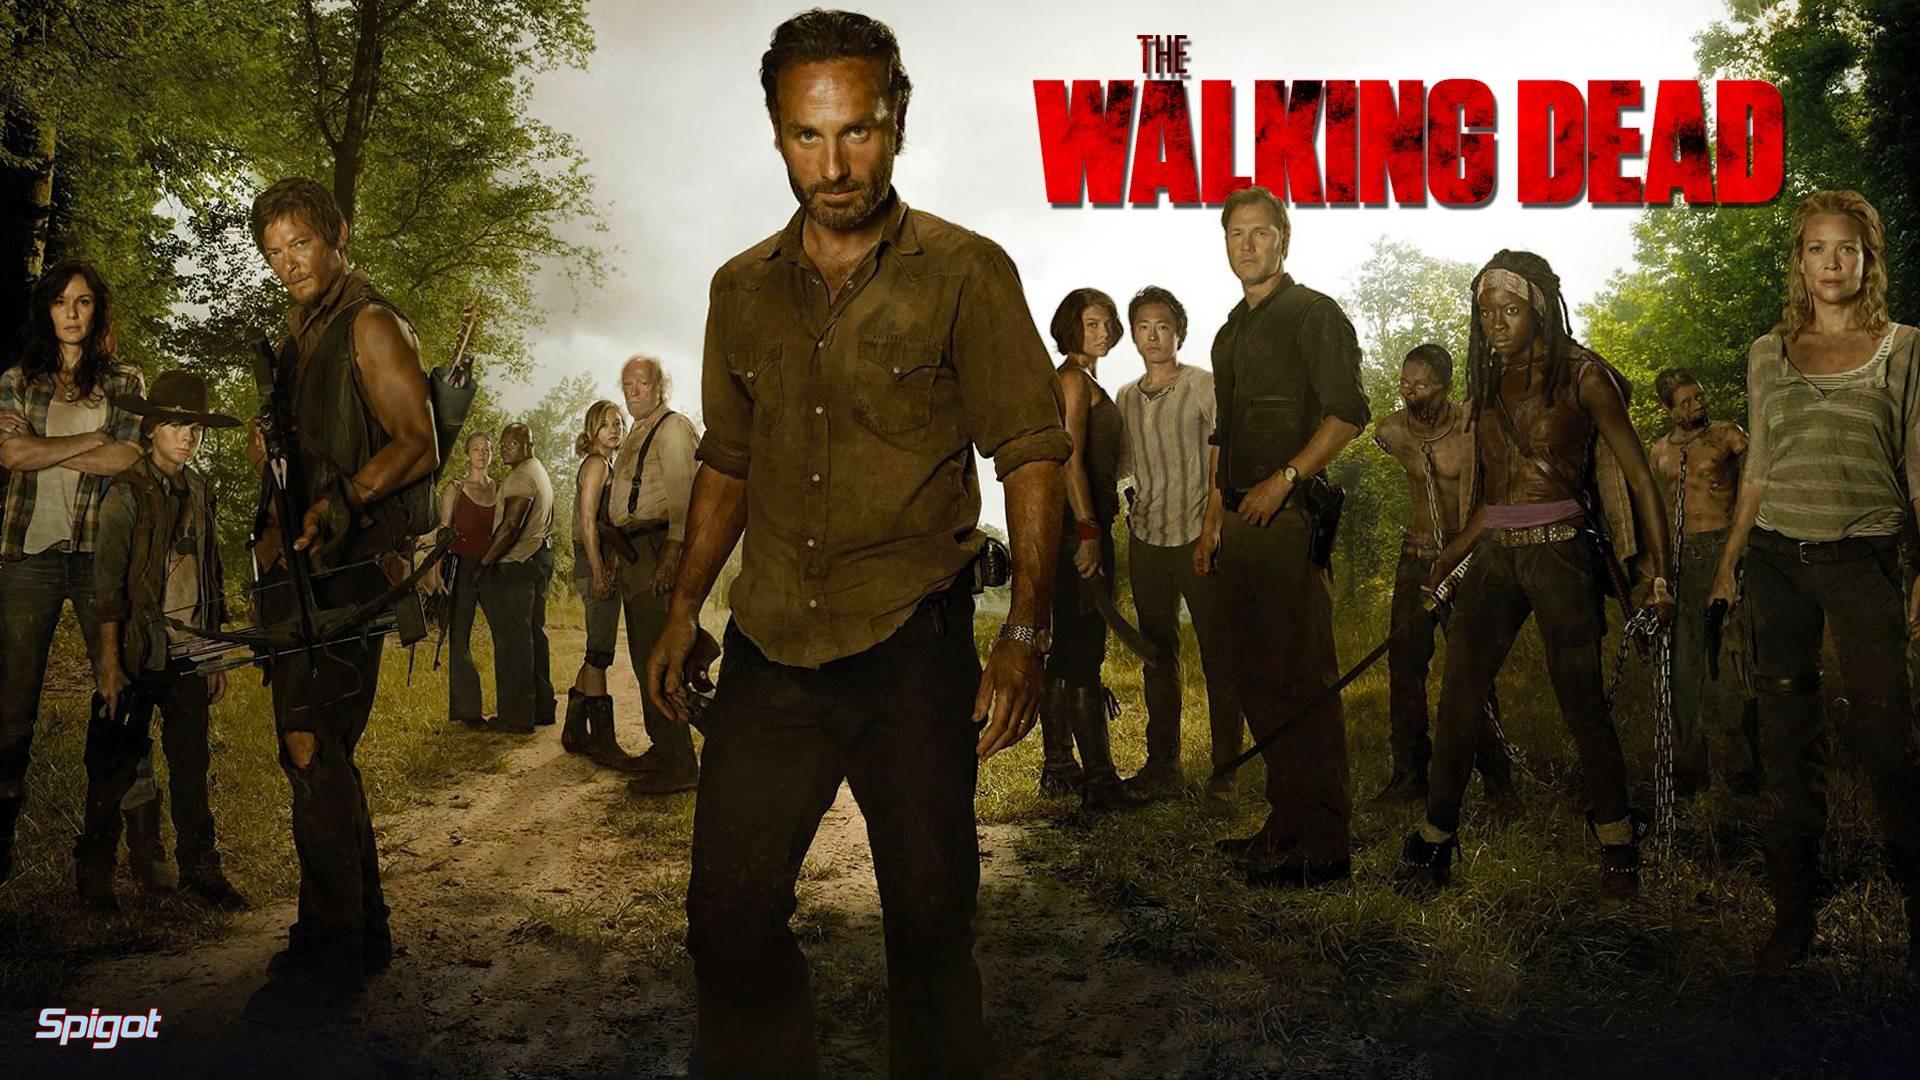 The Walking Dead Wallpapers Wallpaper The Walking Dead Wallpapers Wallpapers )